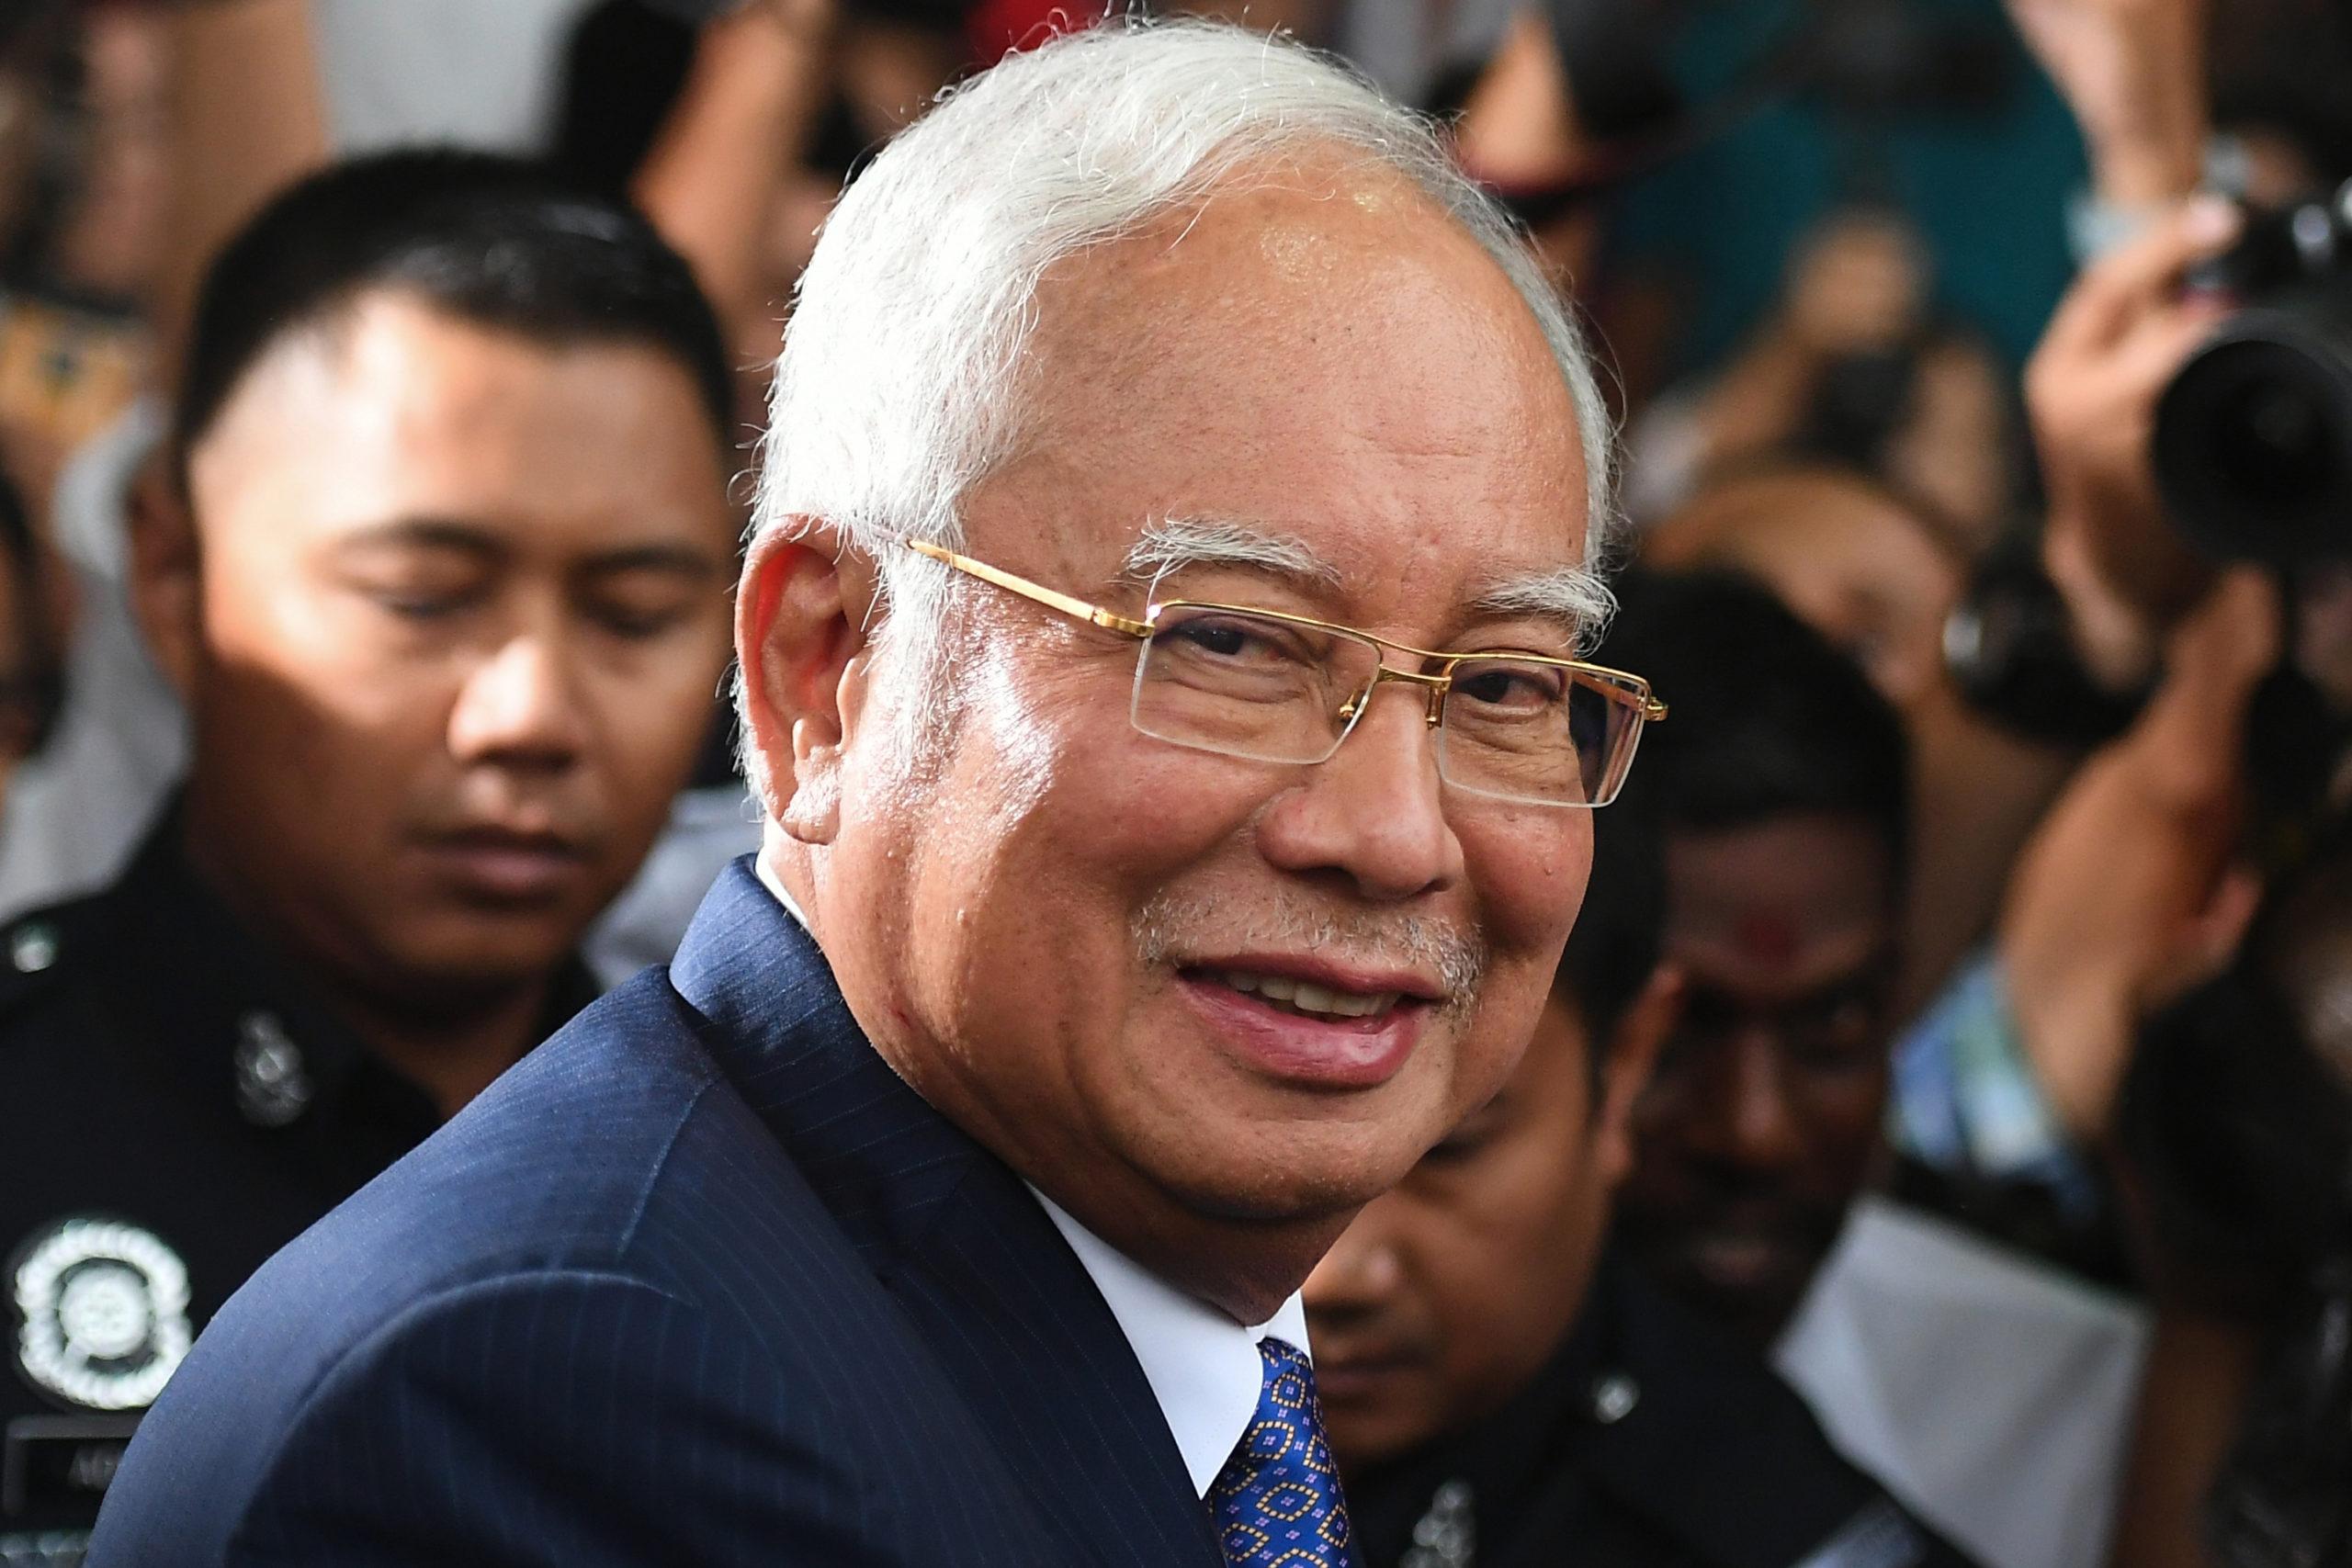 1MDB: The story behind Malaysia's extraordinary financial scandal